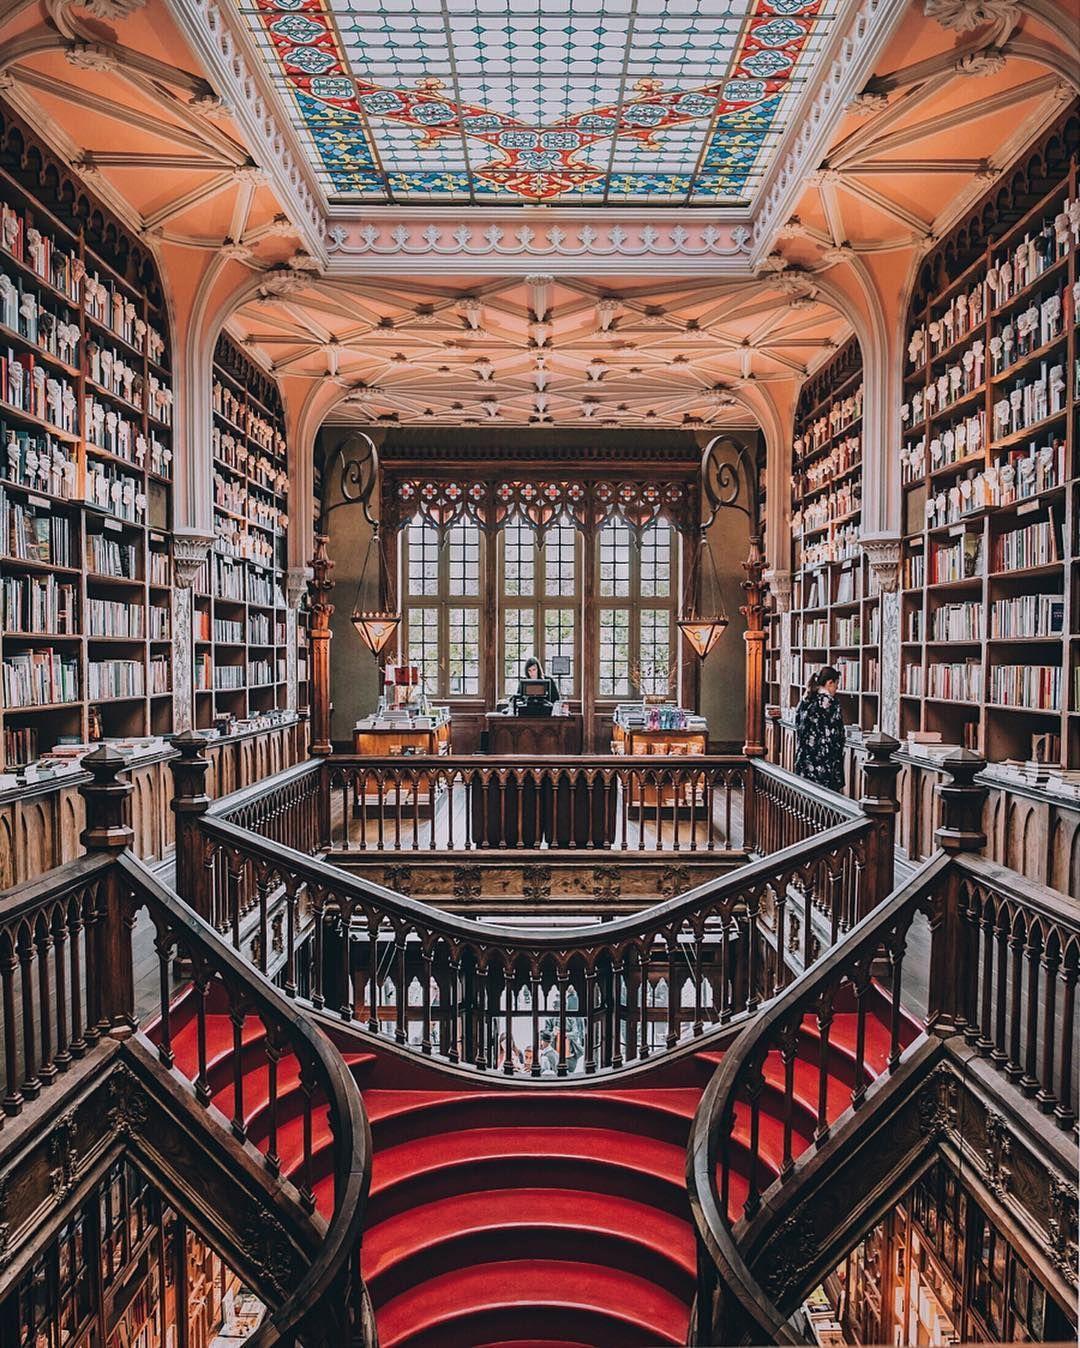 Livraria Lelo A Gorgeous Bookstore In Porto Portugal Bookstore Beautiful Library Portugal